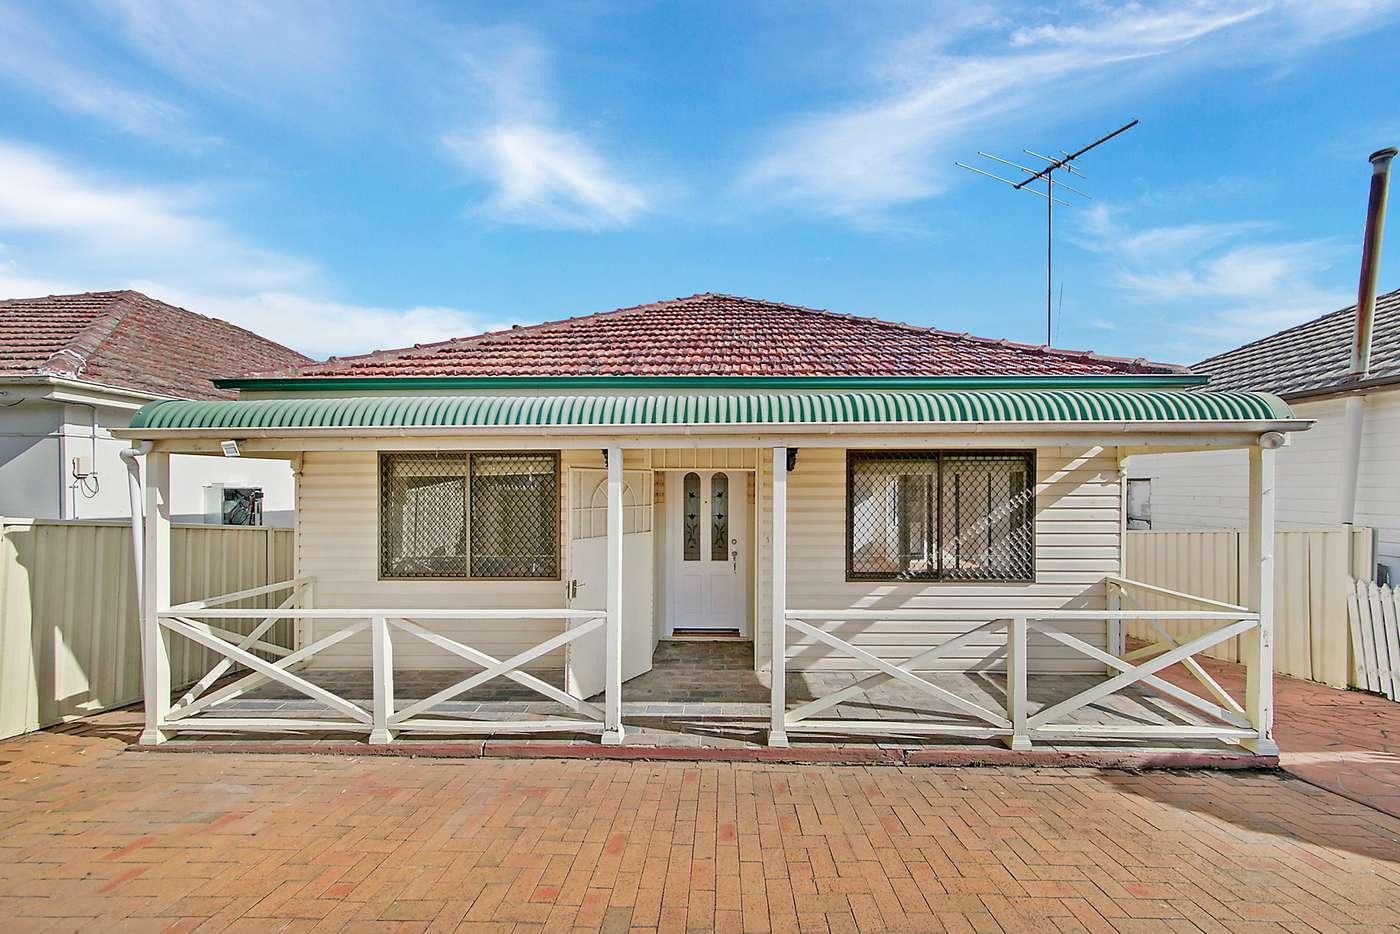 Main view of Homely house listing, 44 Woodbine Street, Yagoona NSW 2199